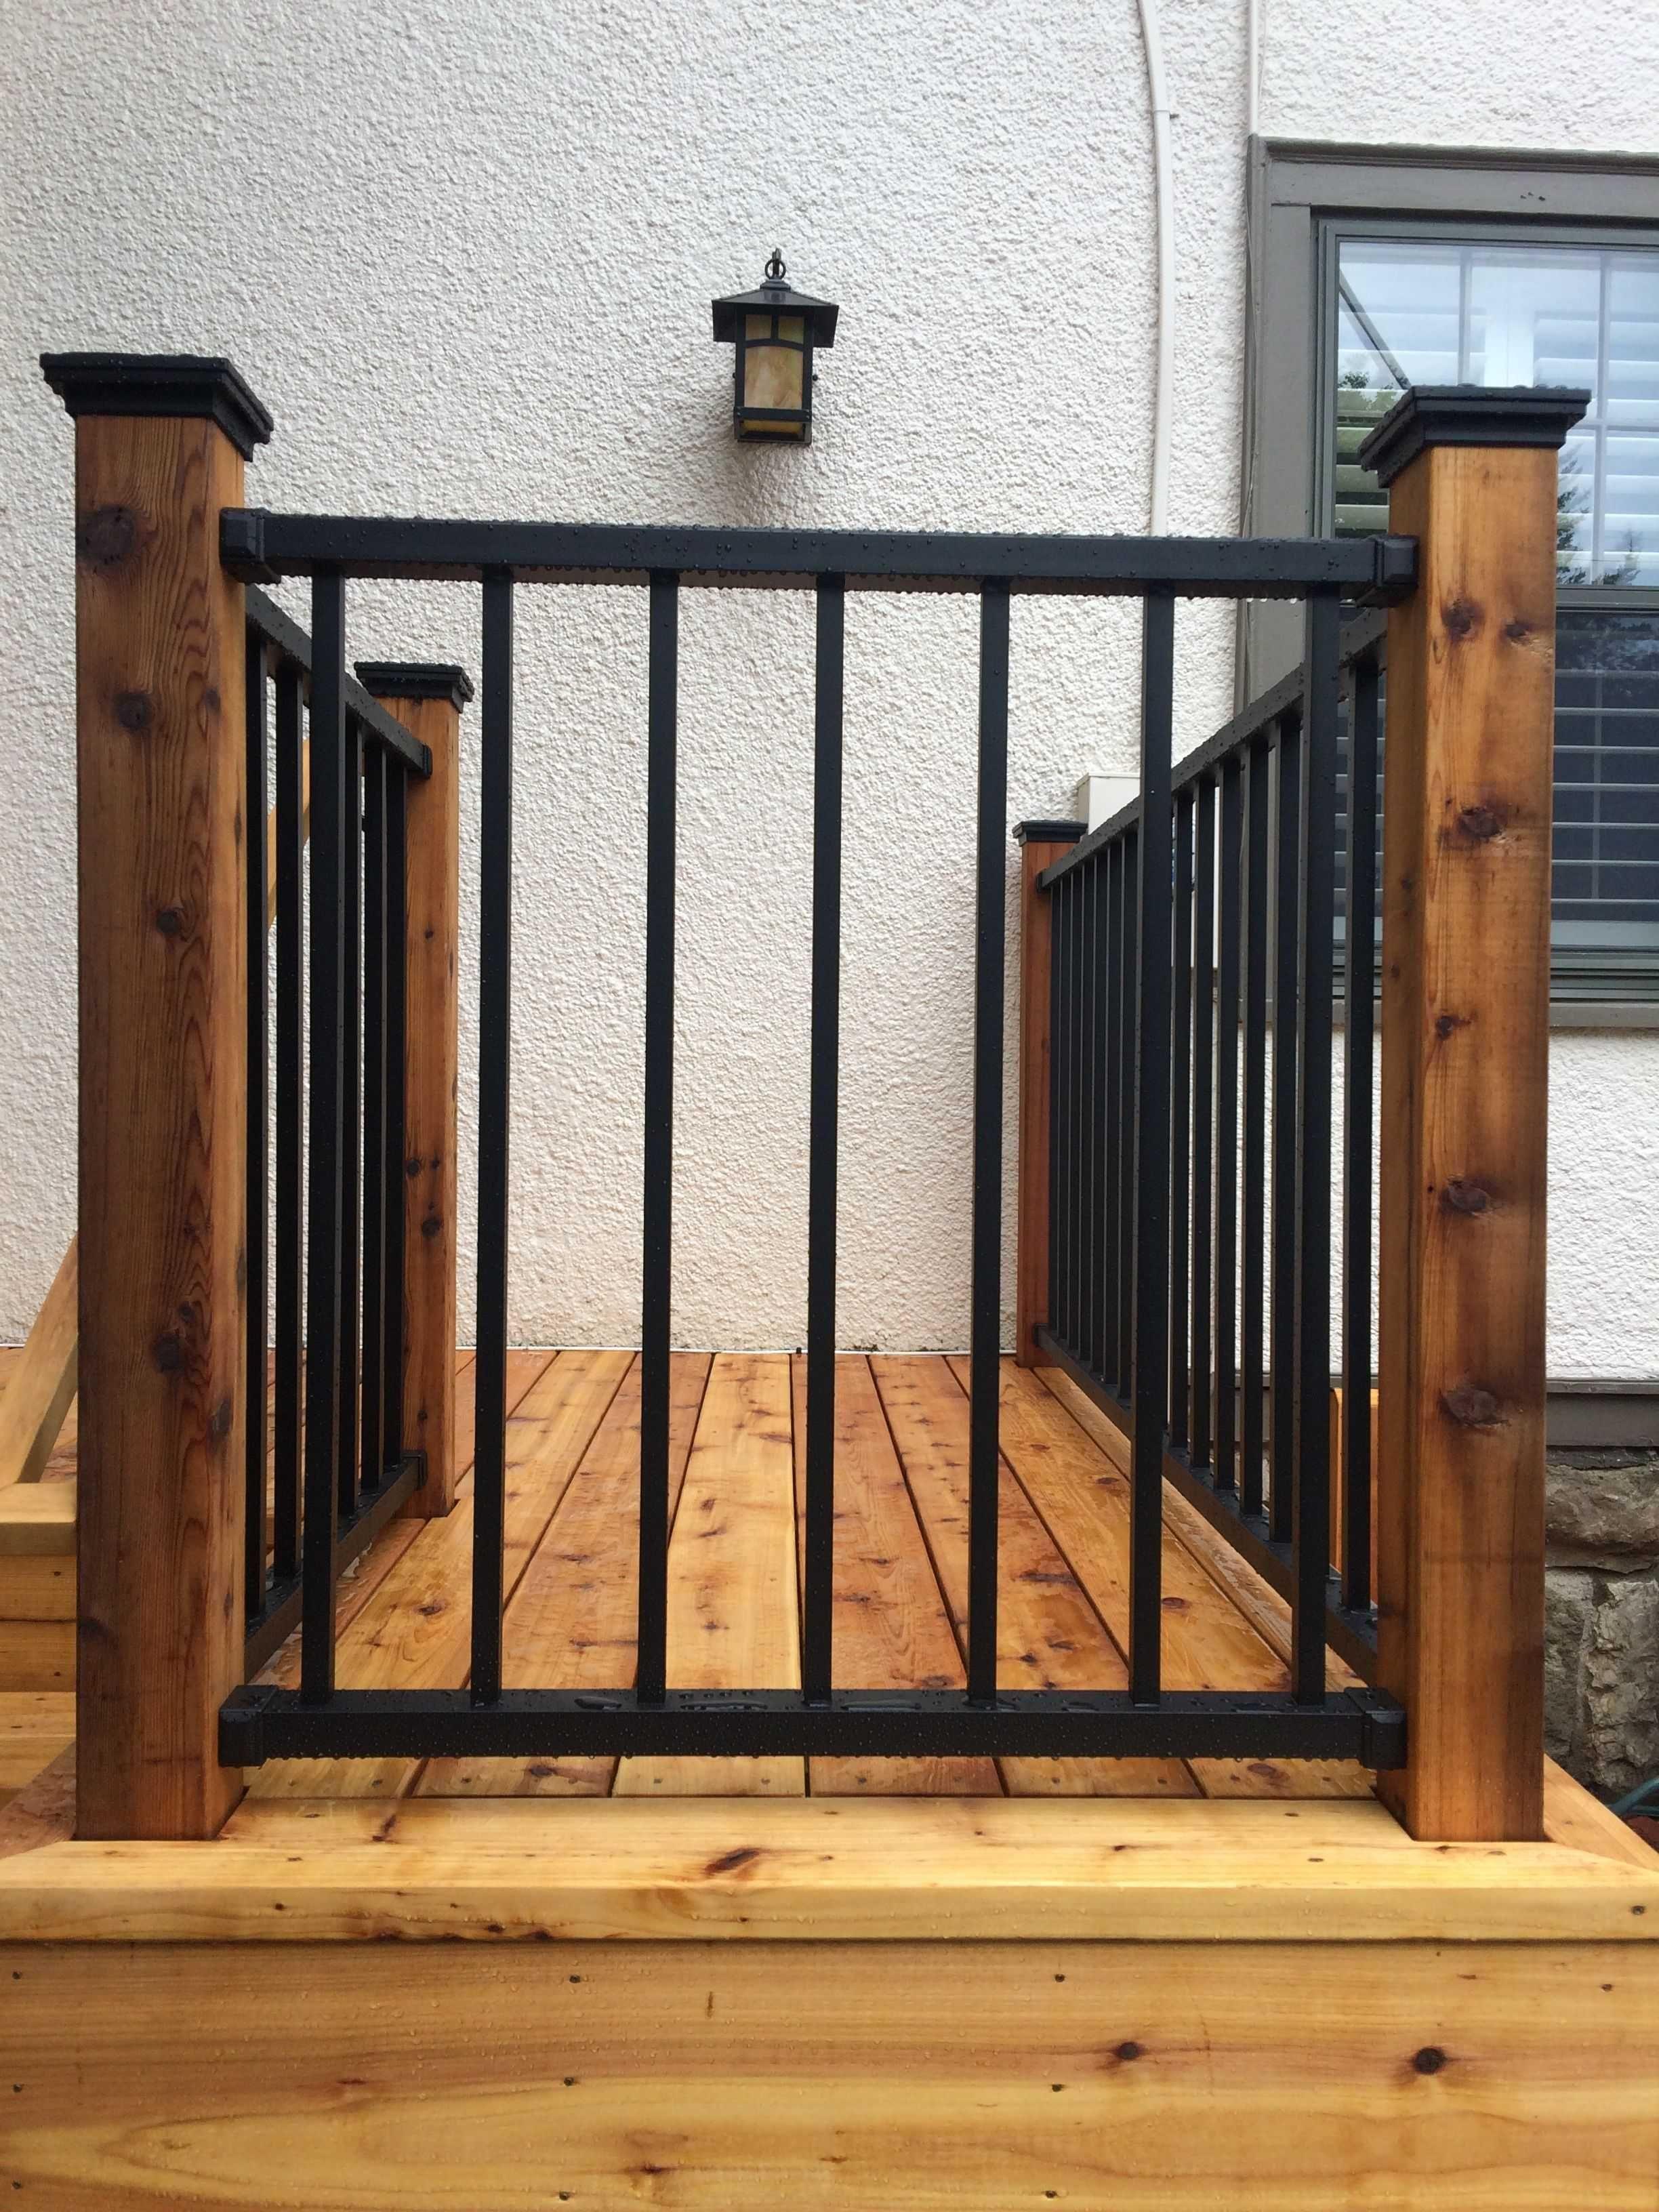 Farmhouse Porch Railing Inspirational Farmhouse Porch Railing | Home Depot Outside Handrails | Treated Lumber | Deck | Metal | Composite | Staircase